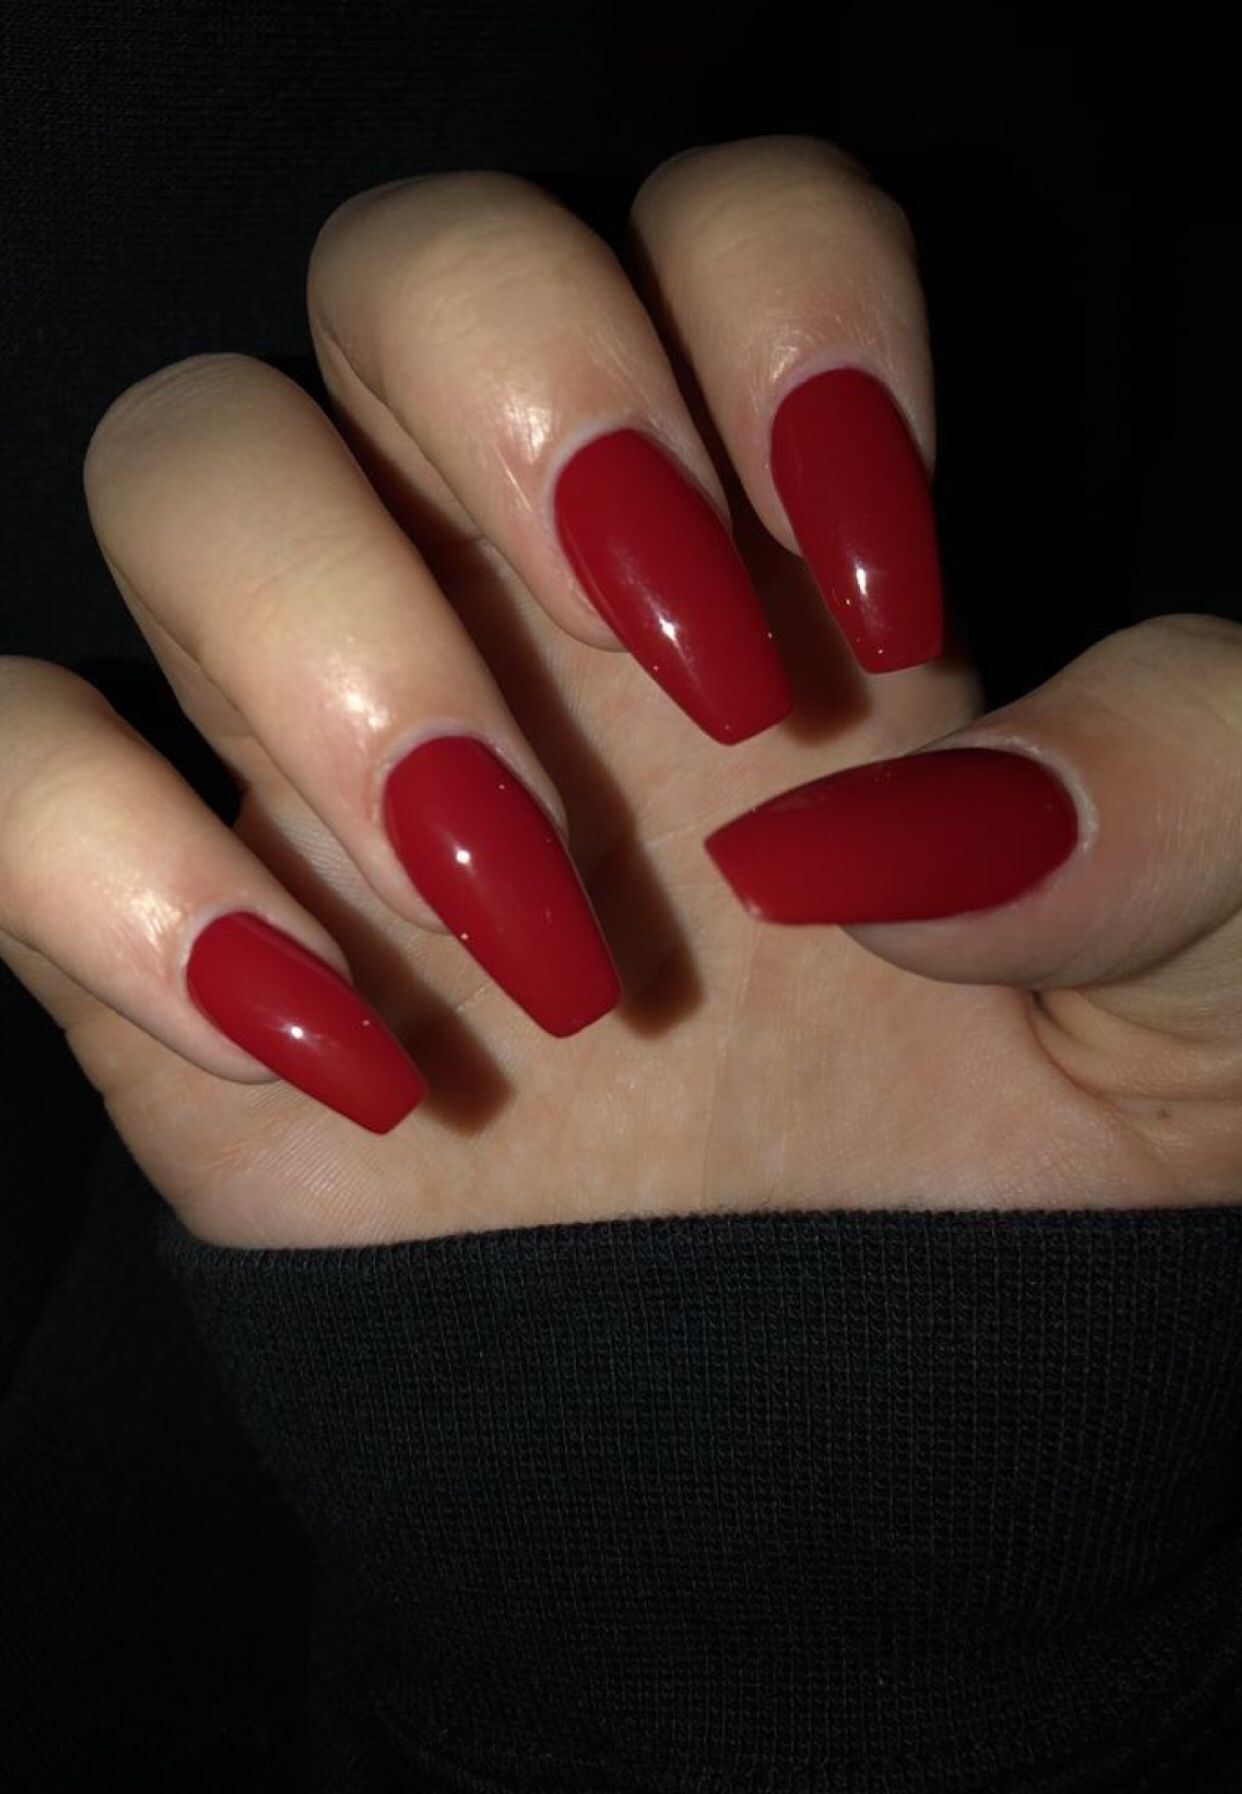 Vermelho Red Acrylic Nails Fake Nails Nails